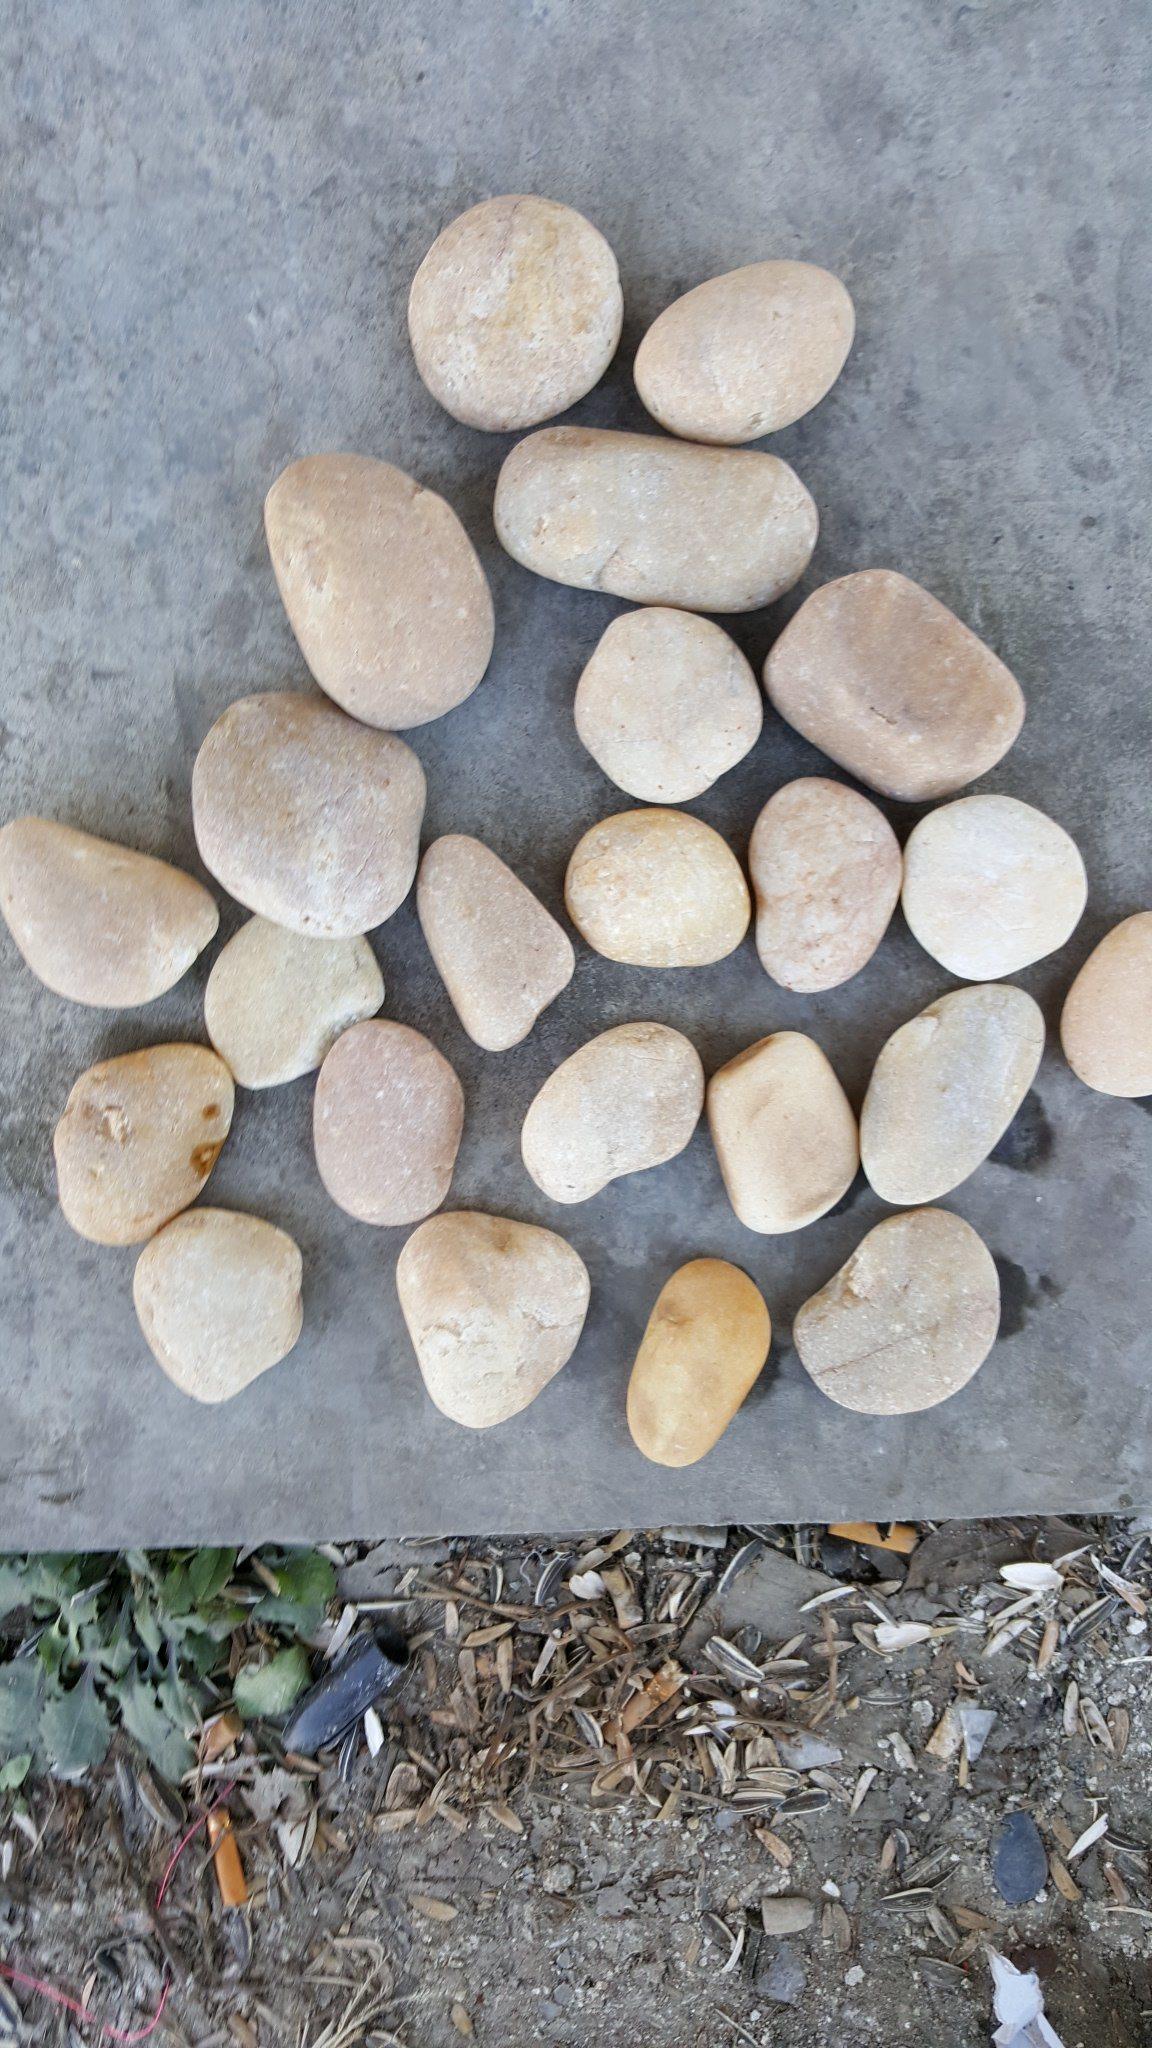 China Polished Pebble Stone Sliced